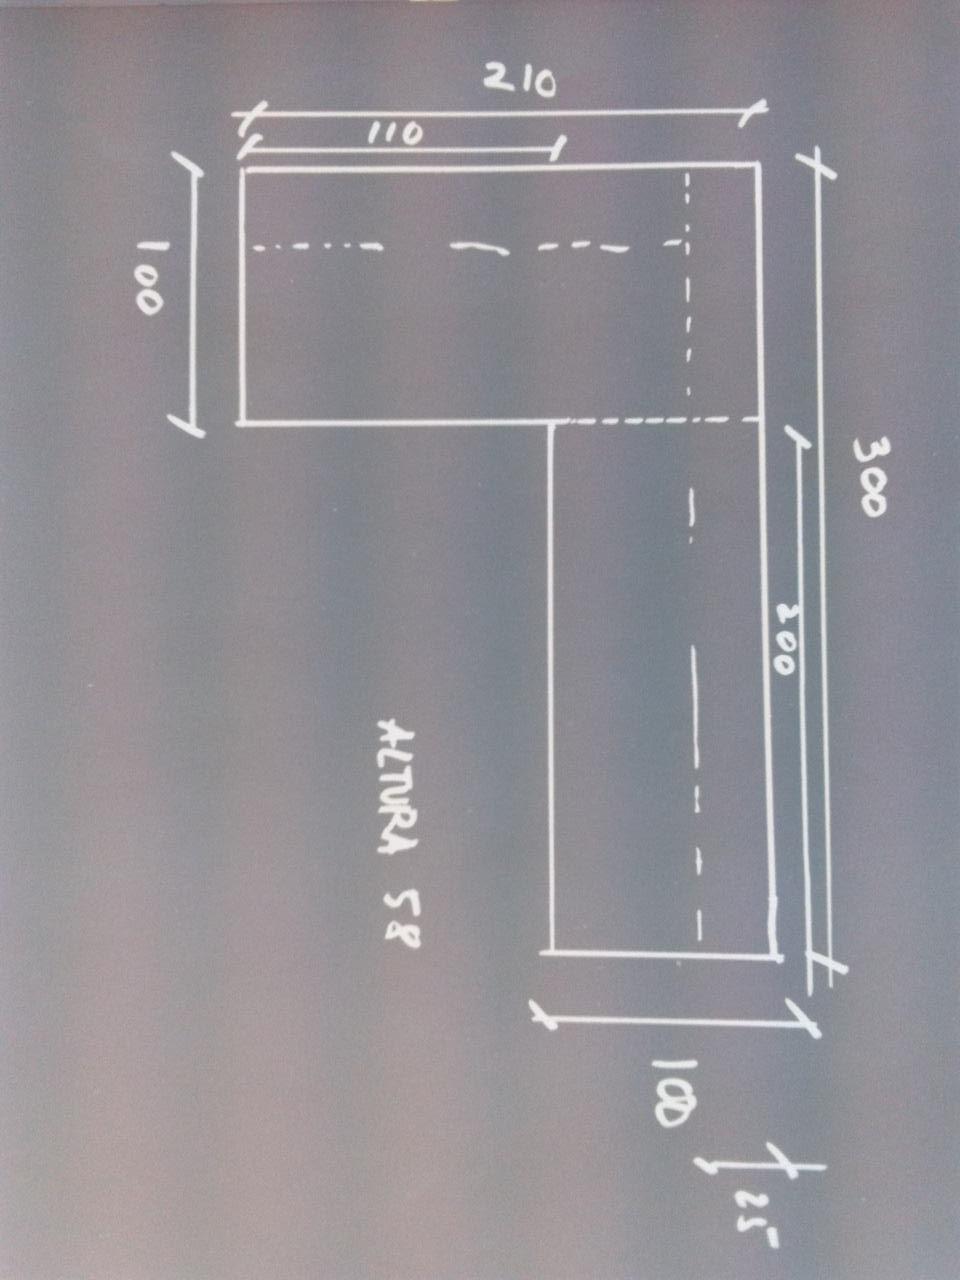 Sofa arketipo medidas - Medidas de sofas 3 2 ...